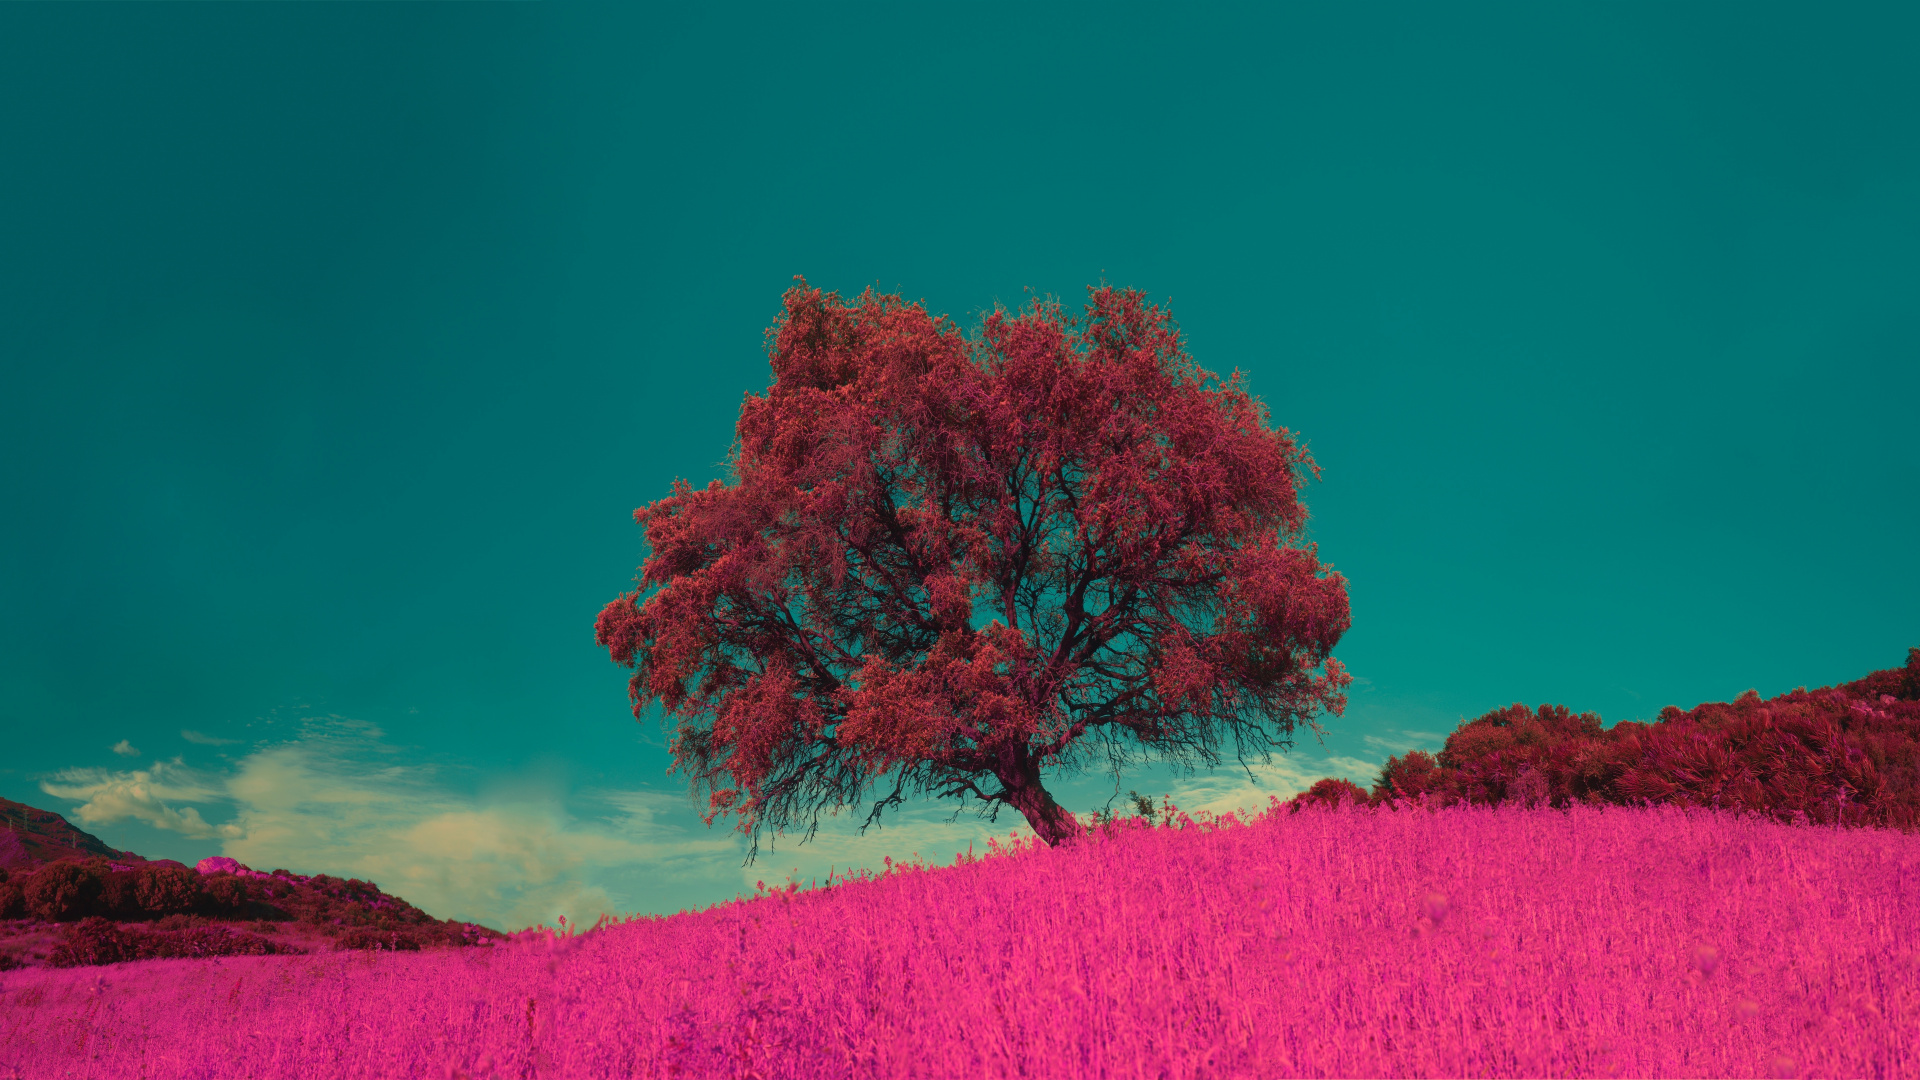 Розовый луг цветы луг дерево